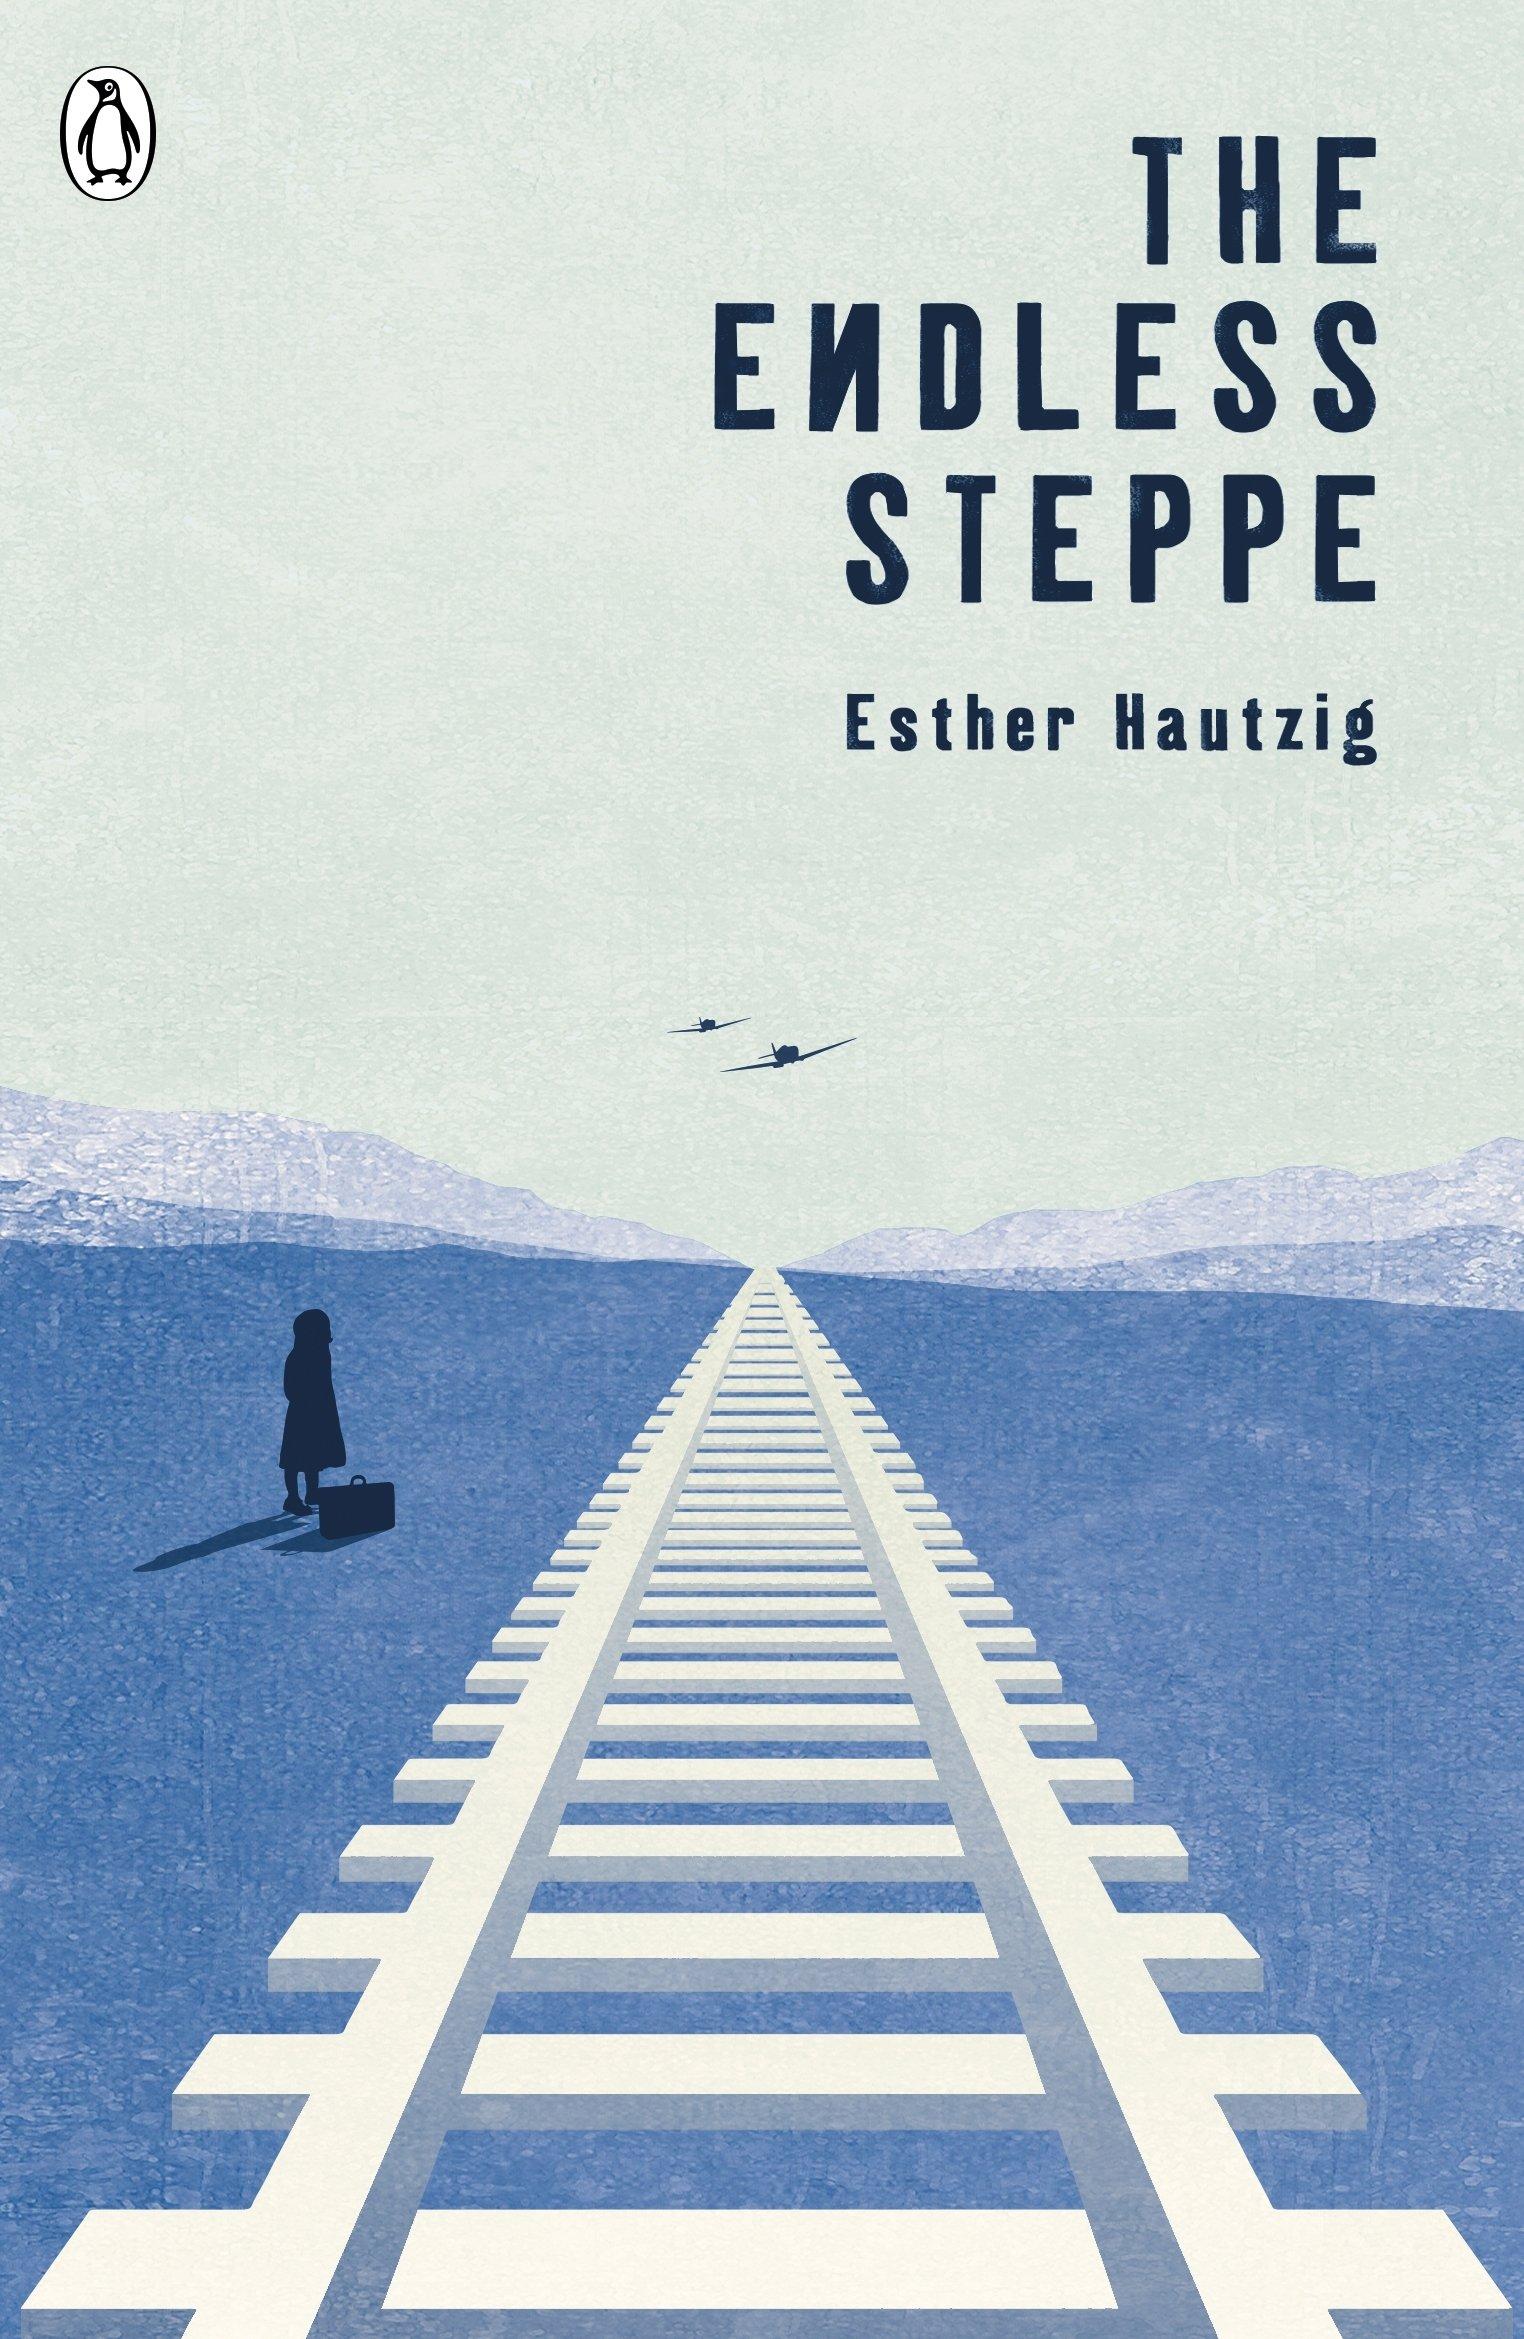 Download The Endless Steppe (The Originals) pdf epub